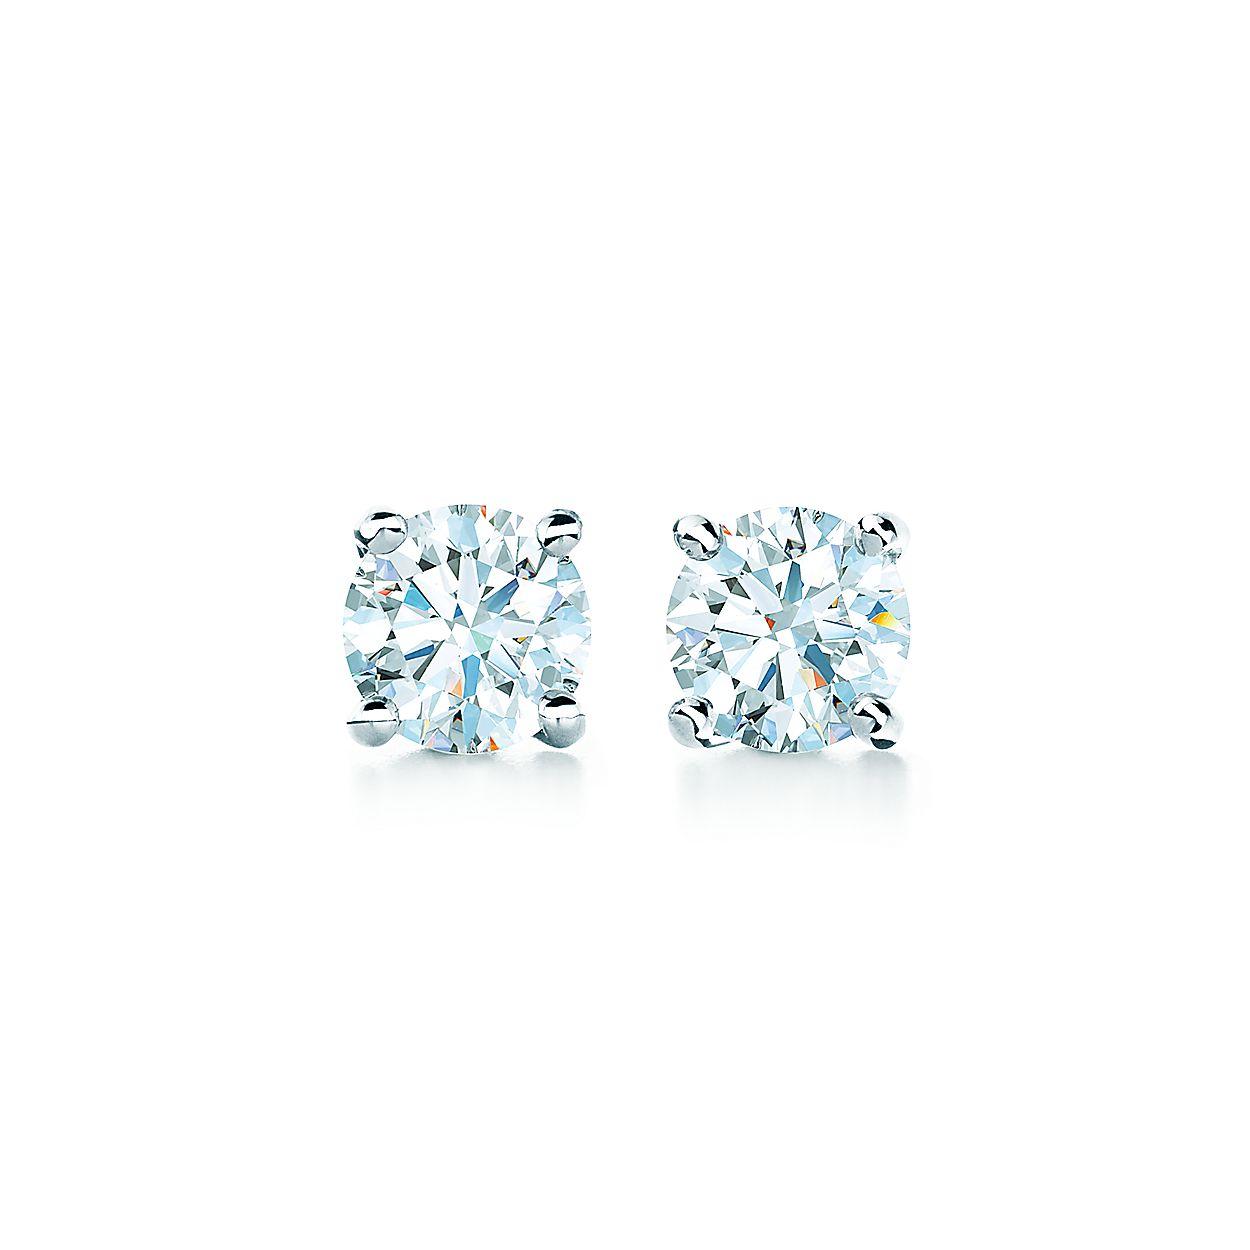 235436ed2ac99 Tiffany Solitaire Diamond Earrings